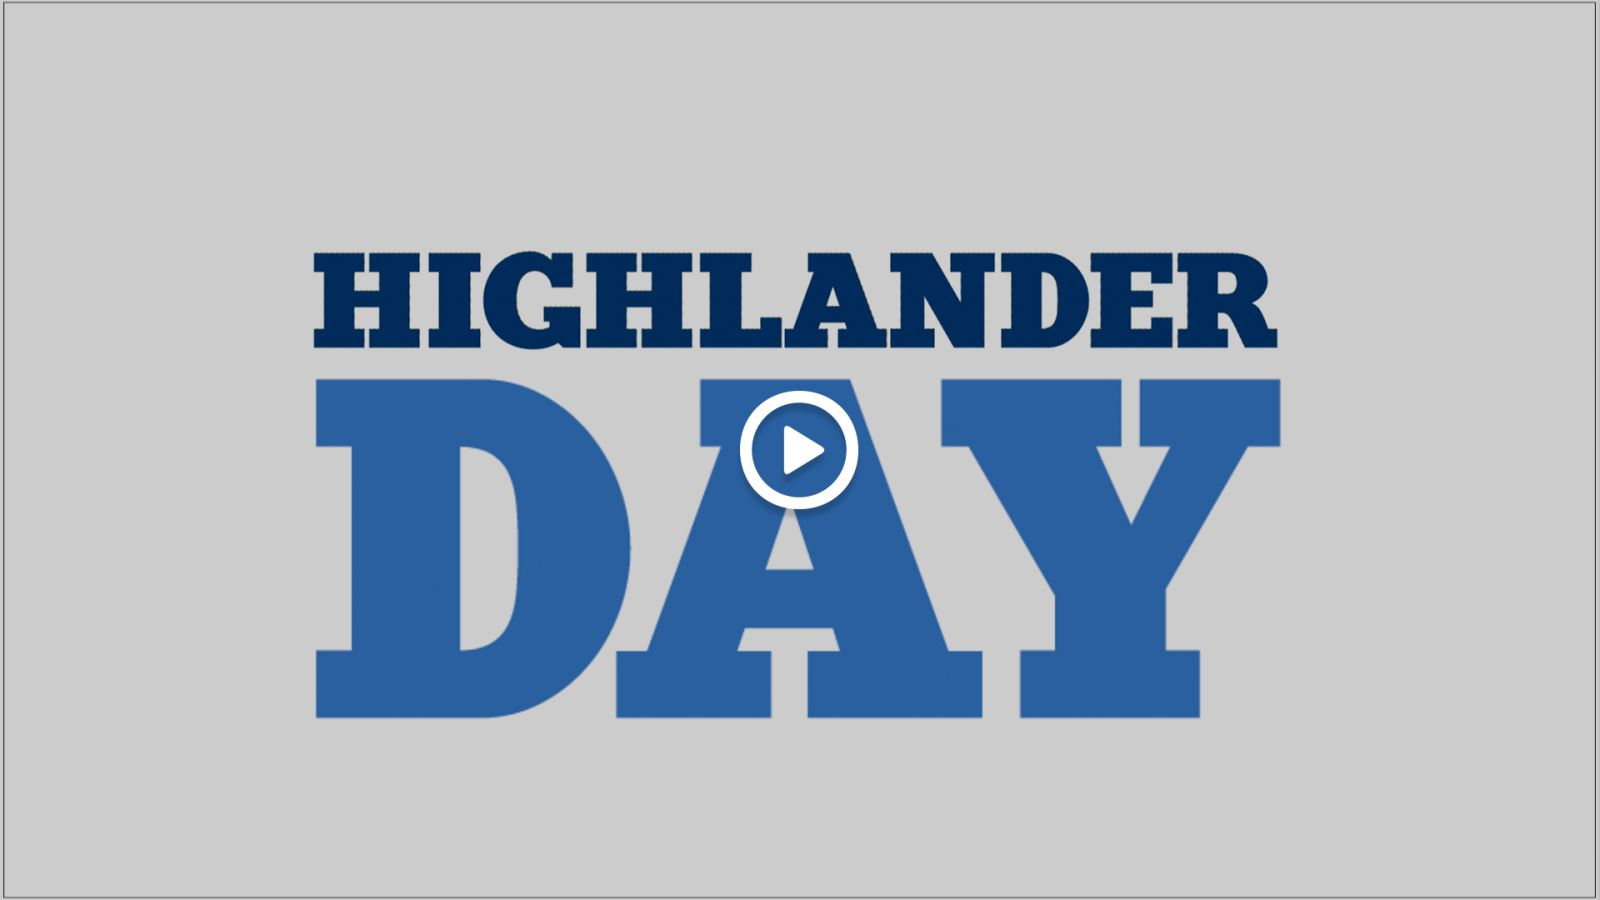 Highlander Day